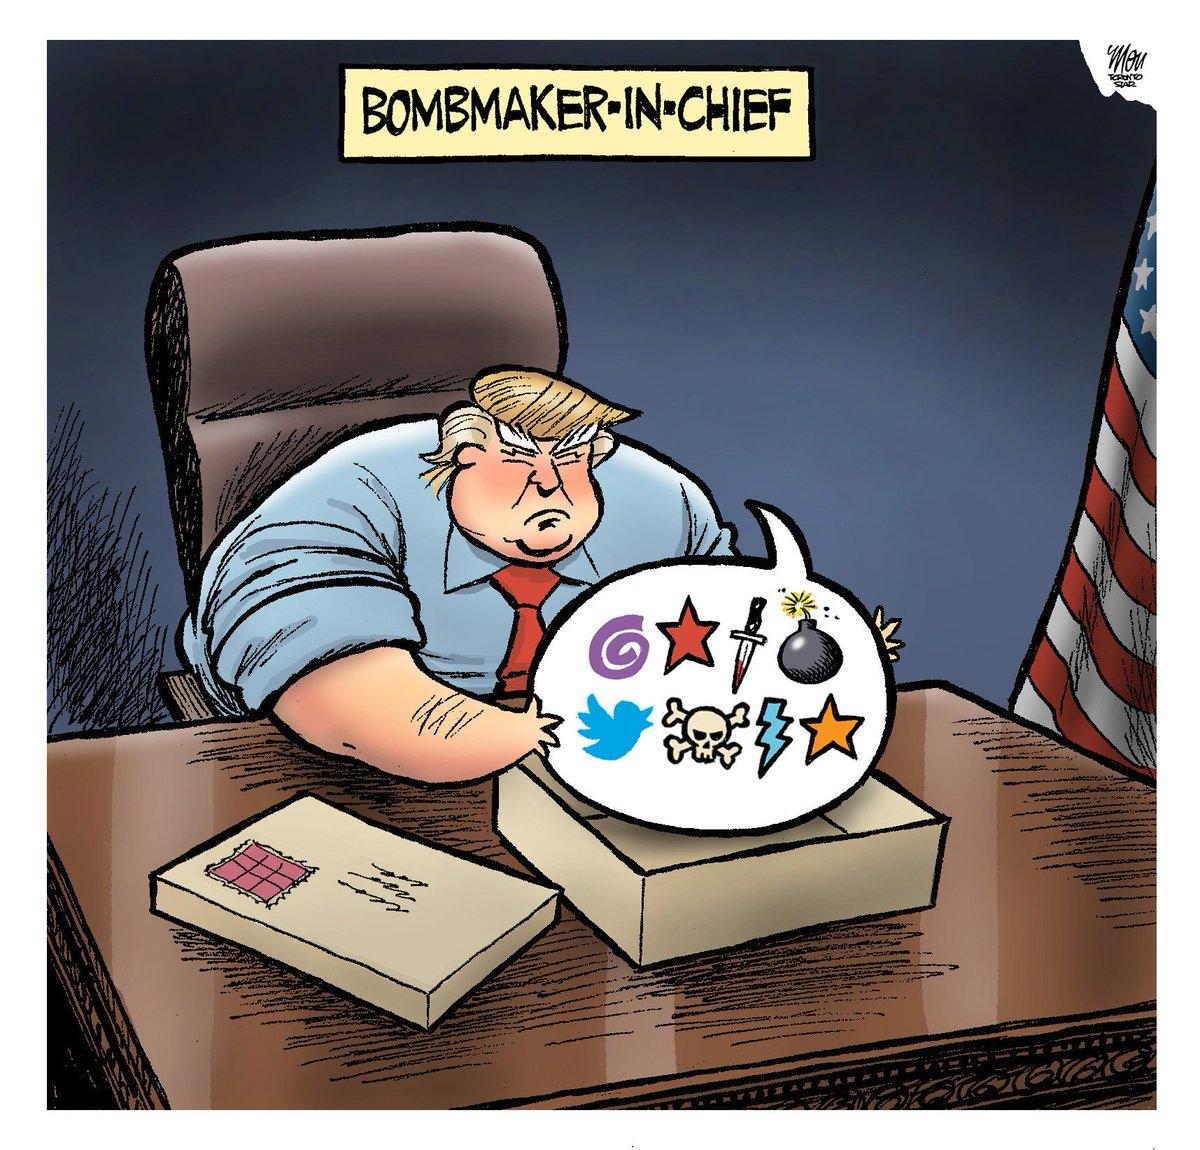 Here's Thursday's #bombthreat cartoon in @TorontoStar #magabomber